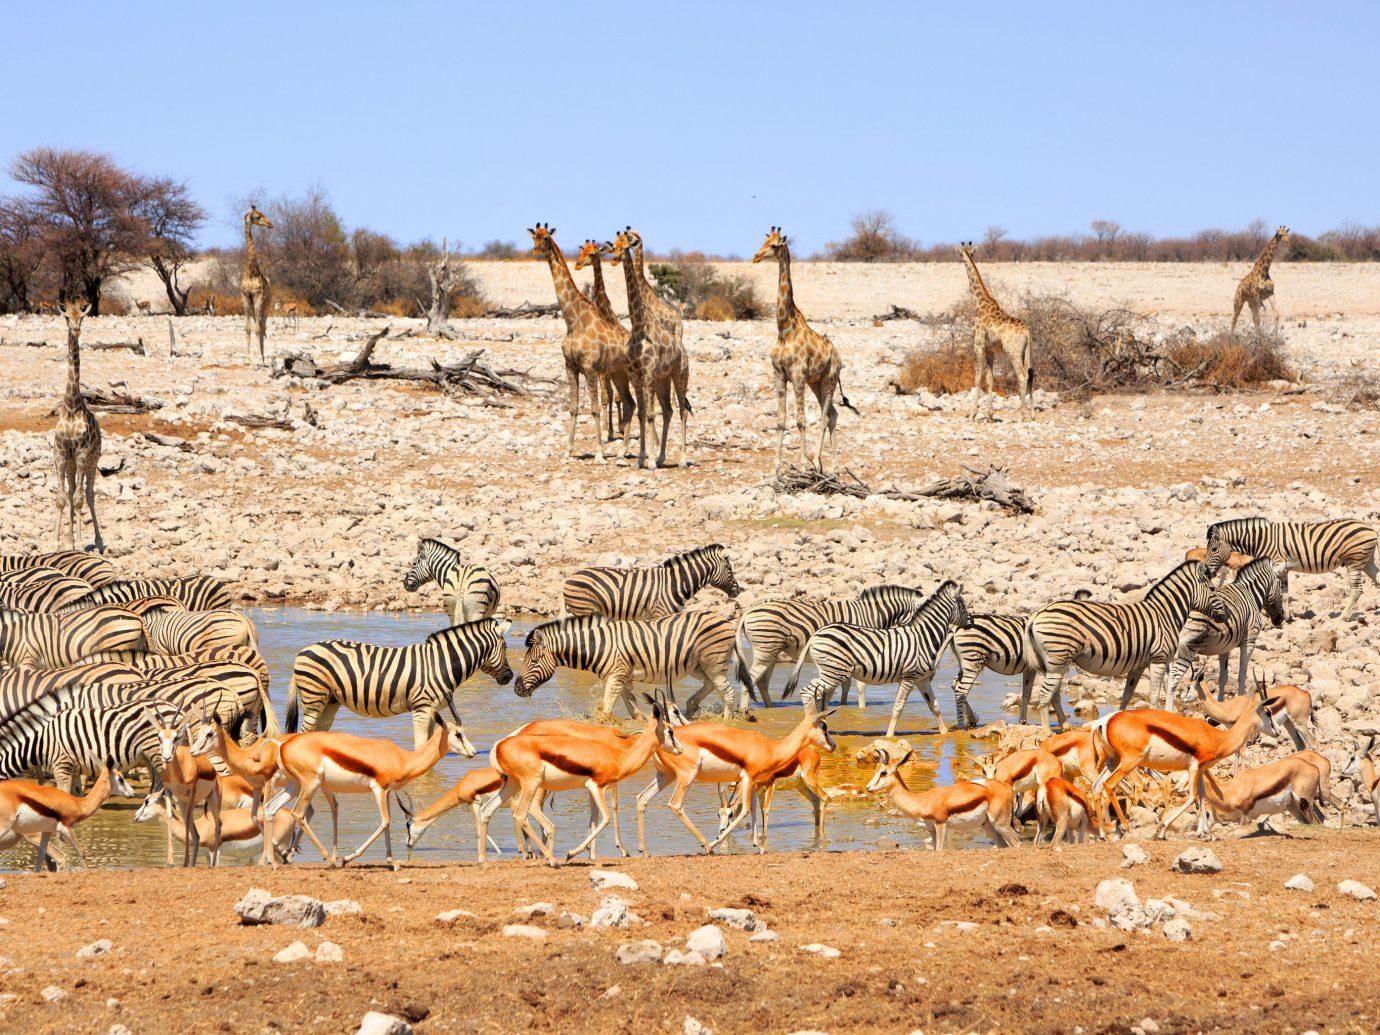 africa Honeymoon Namibia Romance Trip Ideas Wildlife ecosystem herd fauna springbok vicuña savanna ecoregion Safari national park terrestrial animal gazelle grassland prairie shrubland landscape antelope impala animal migration plain